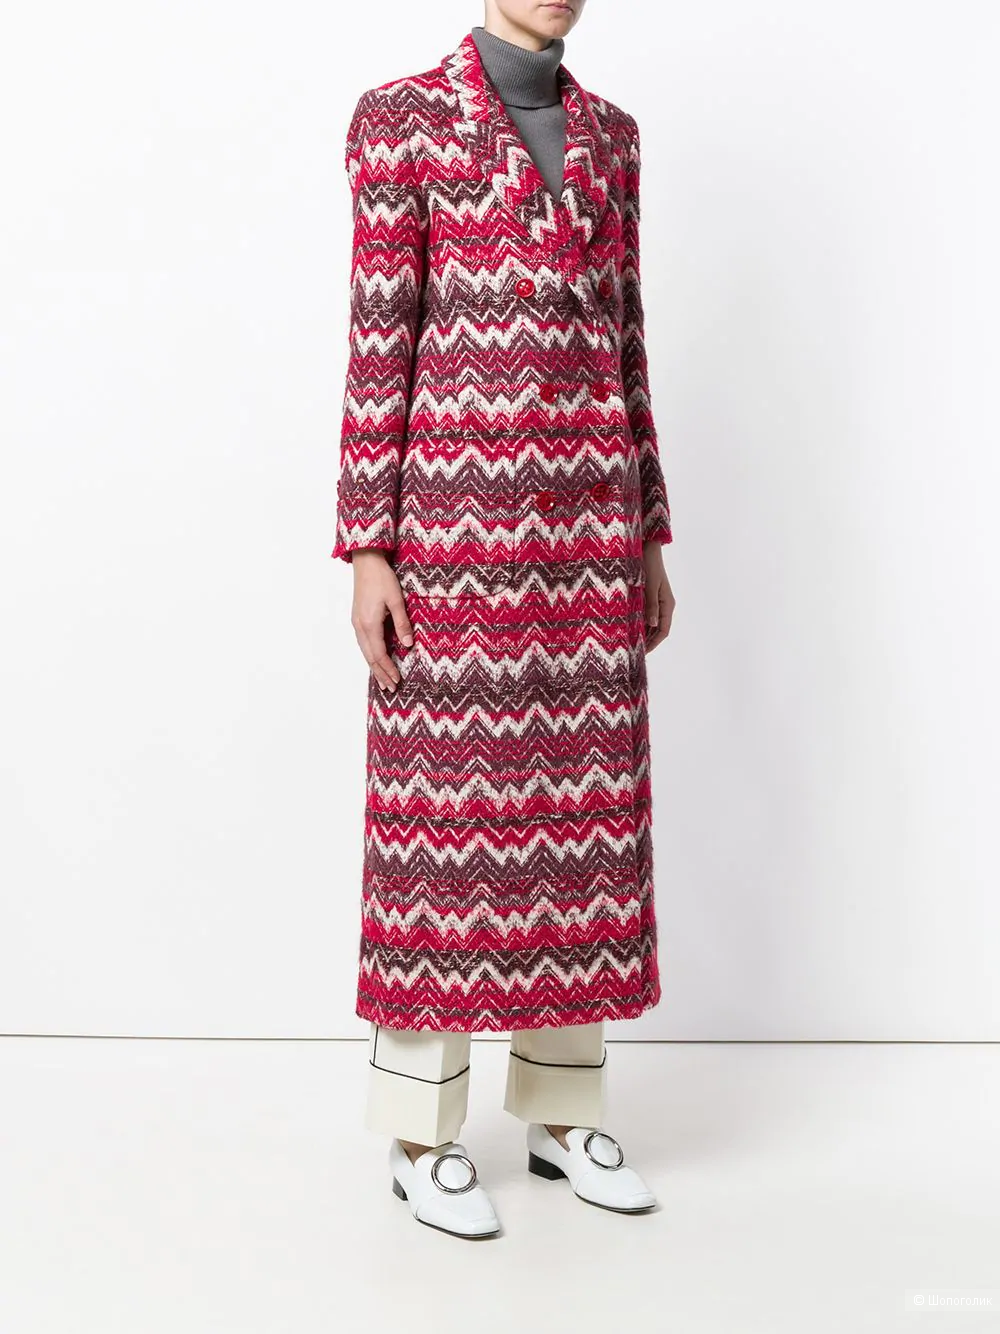 Пальто Miahatami. Размер: 42 IT